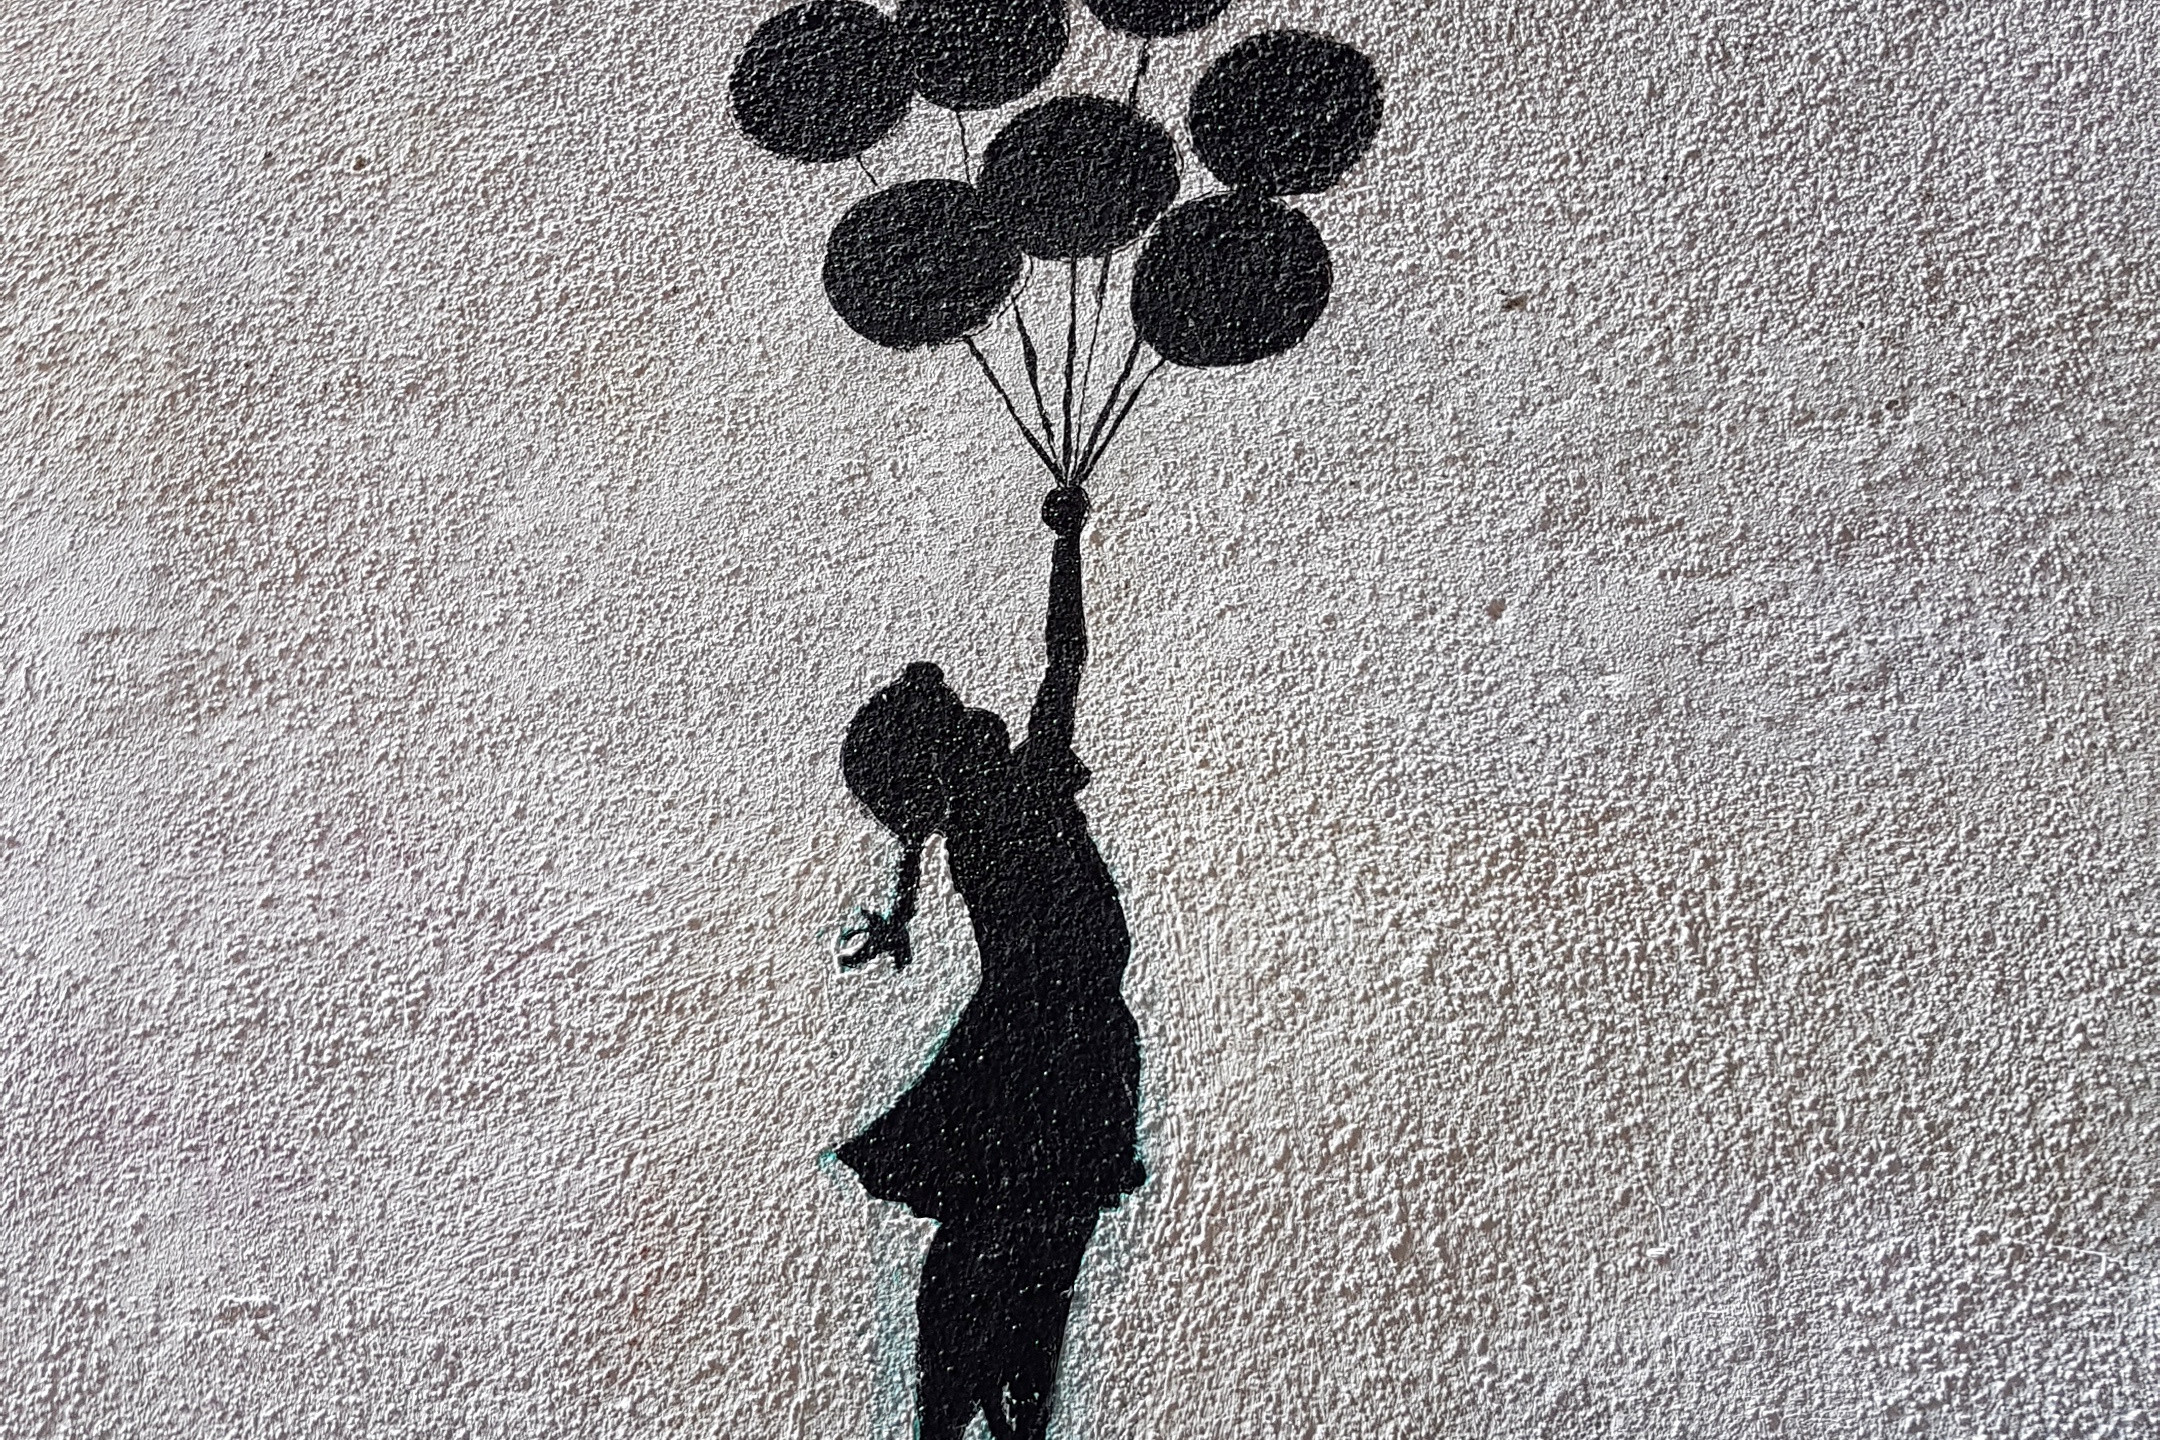 Banksy inspired stencil